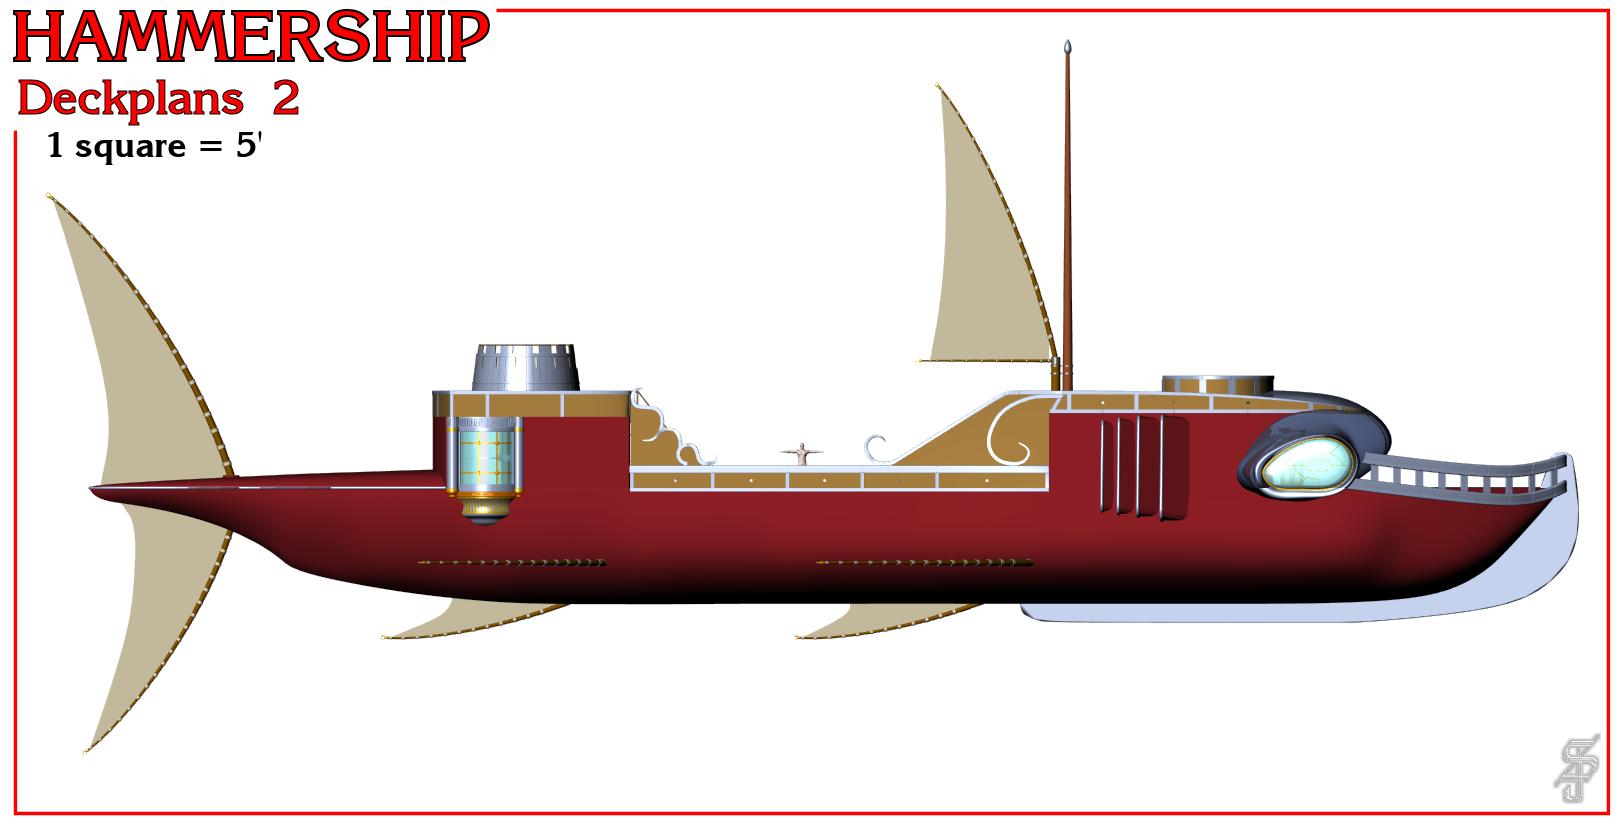 Hammership layout 2